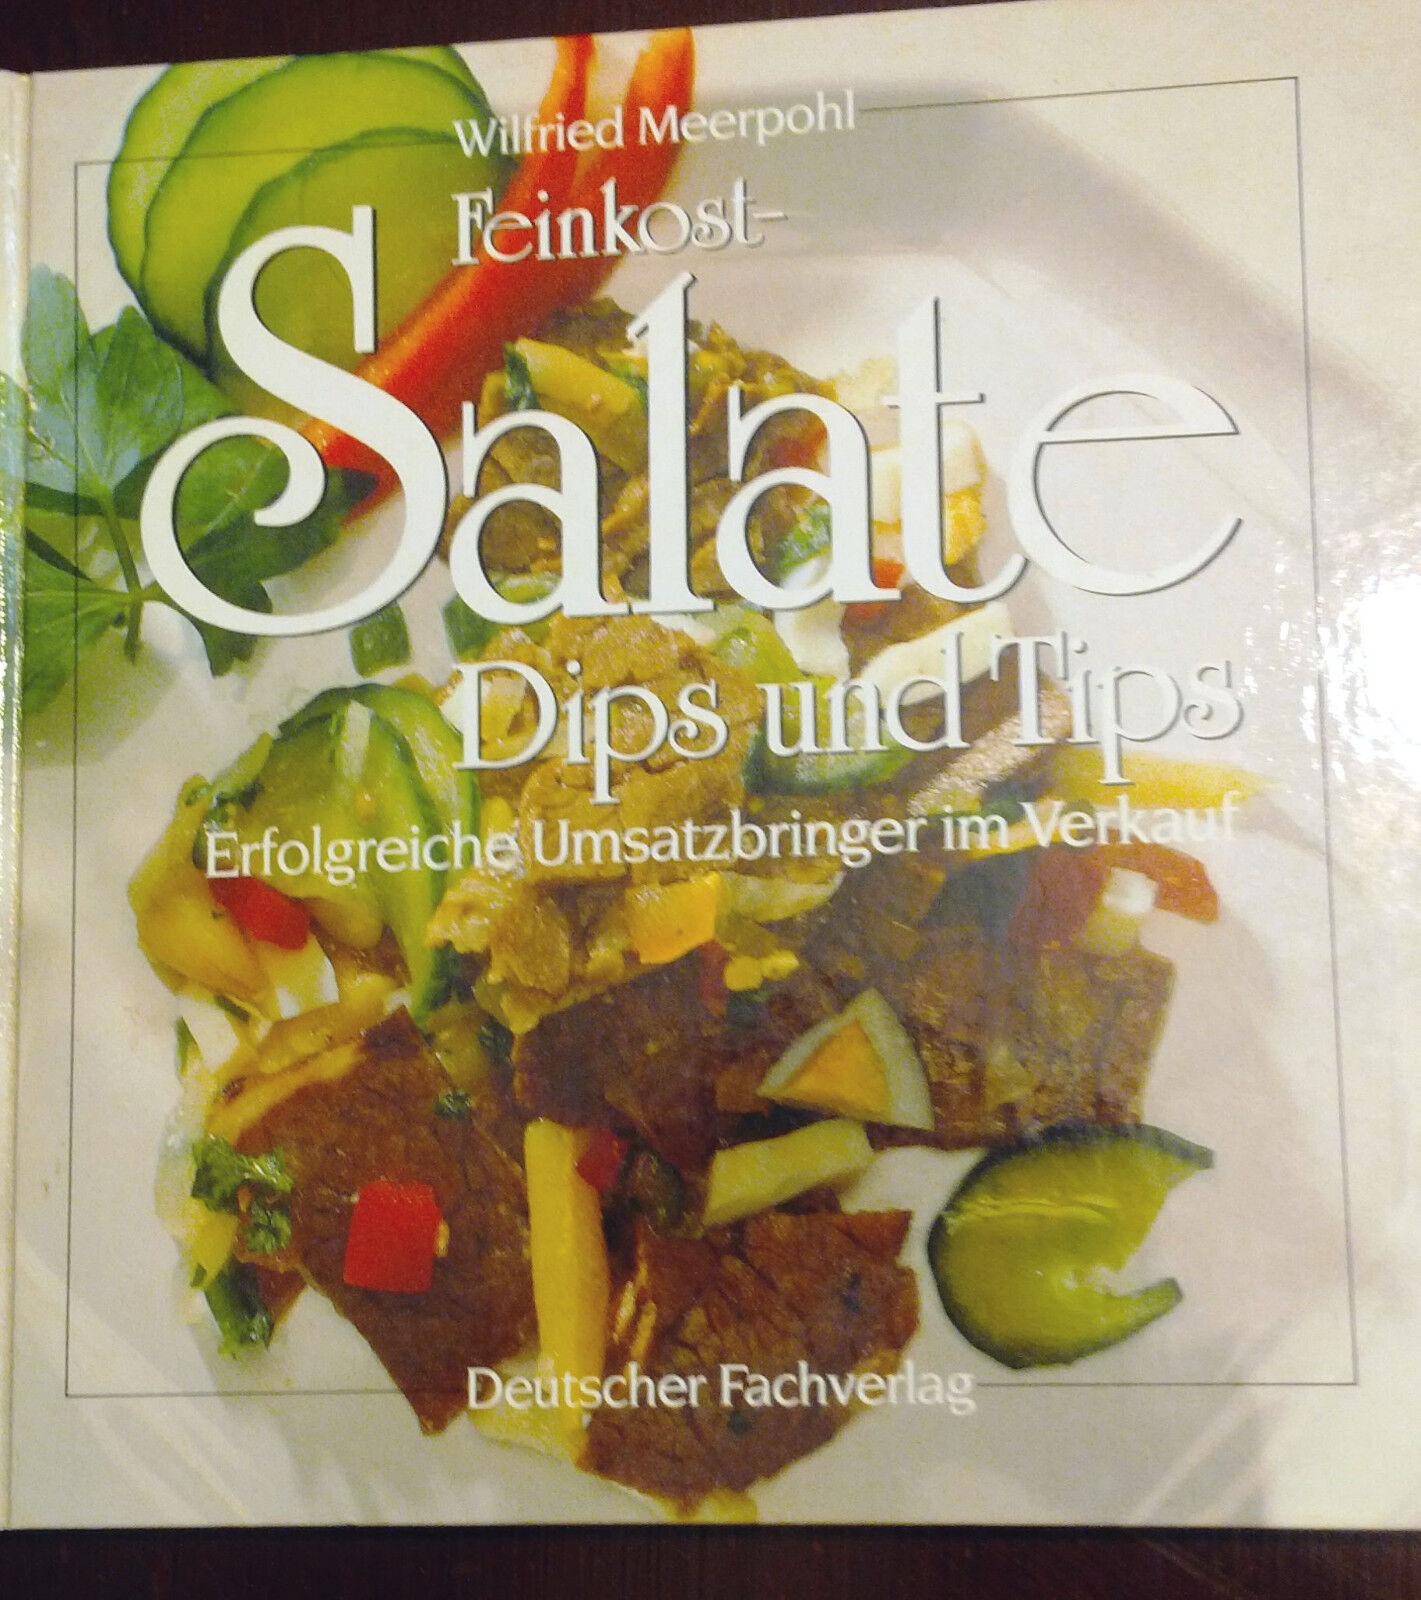 Wilfried Meerpohl: Feinkost-Salate, Dips und Tips